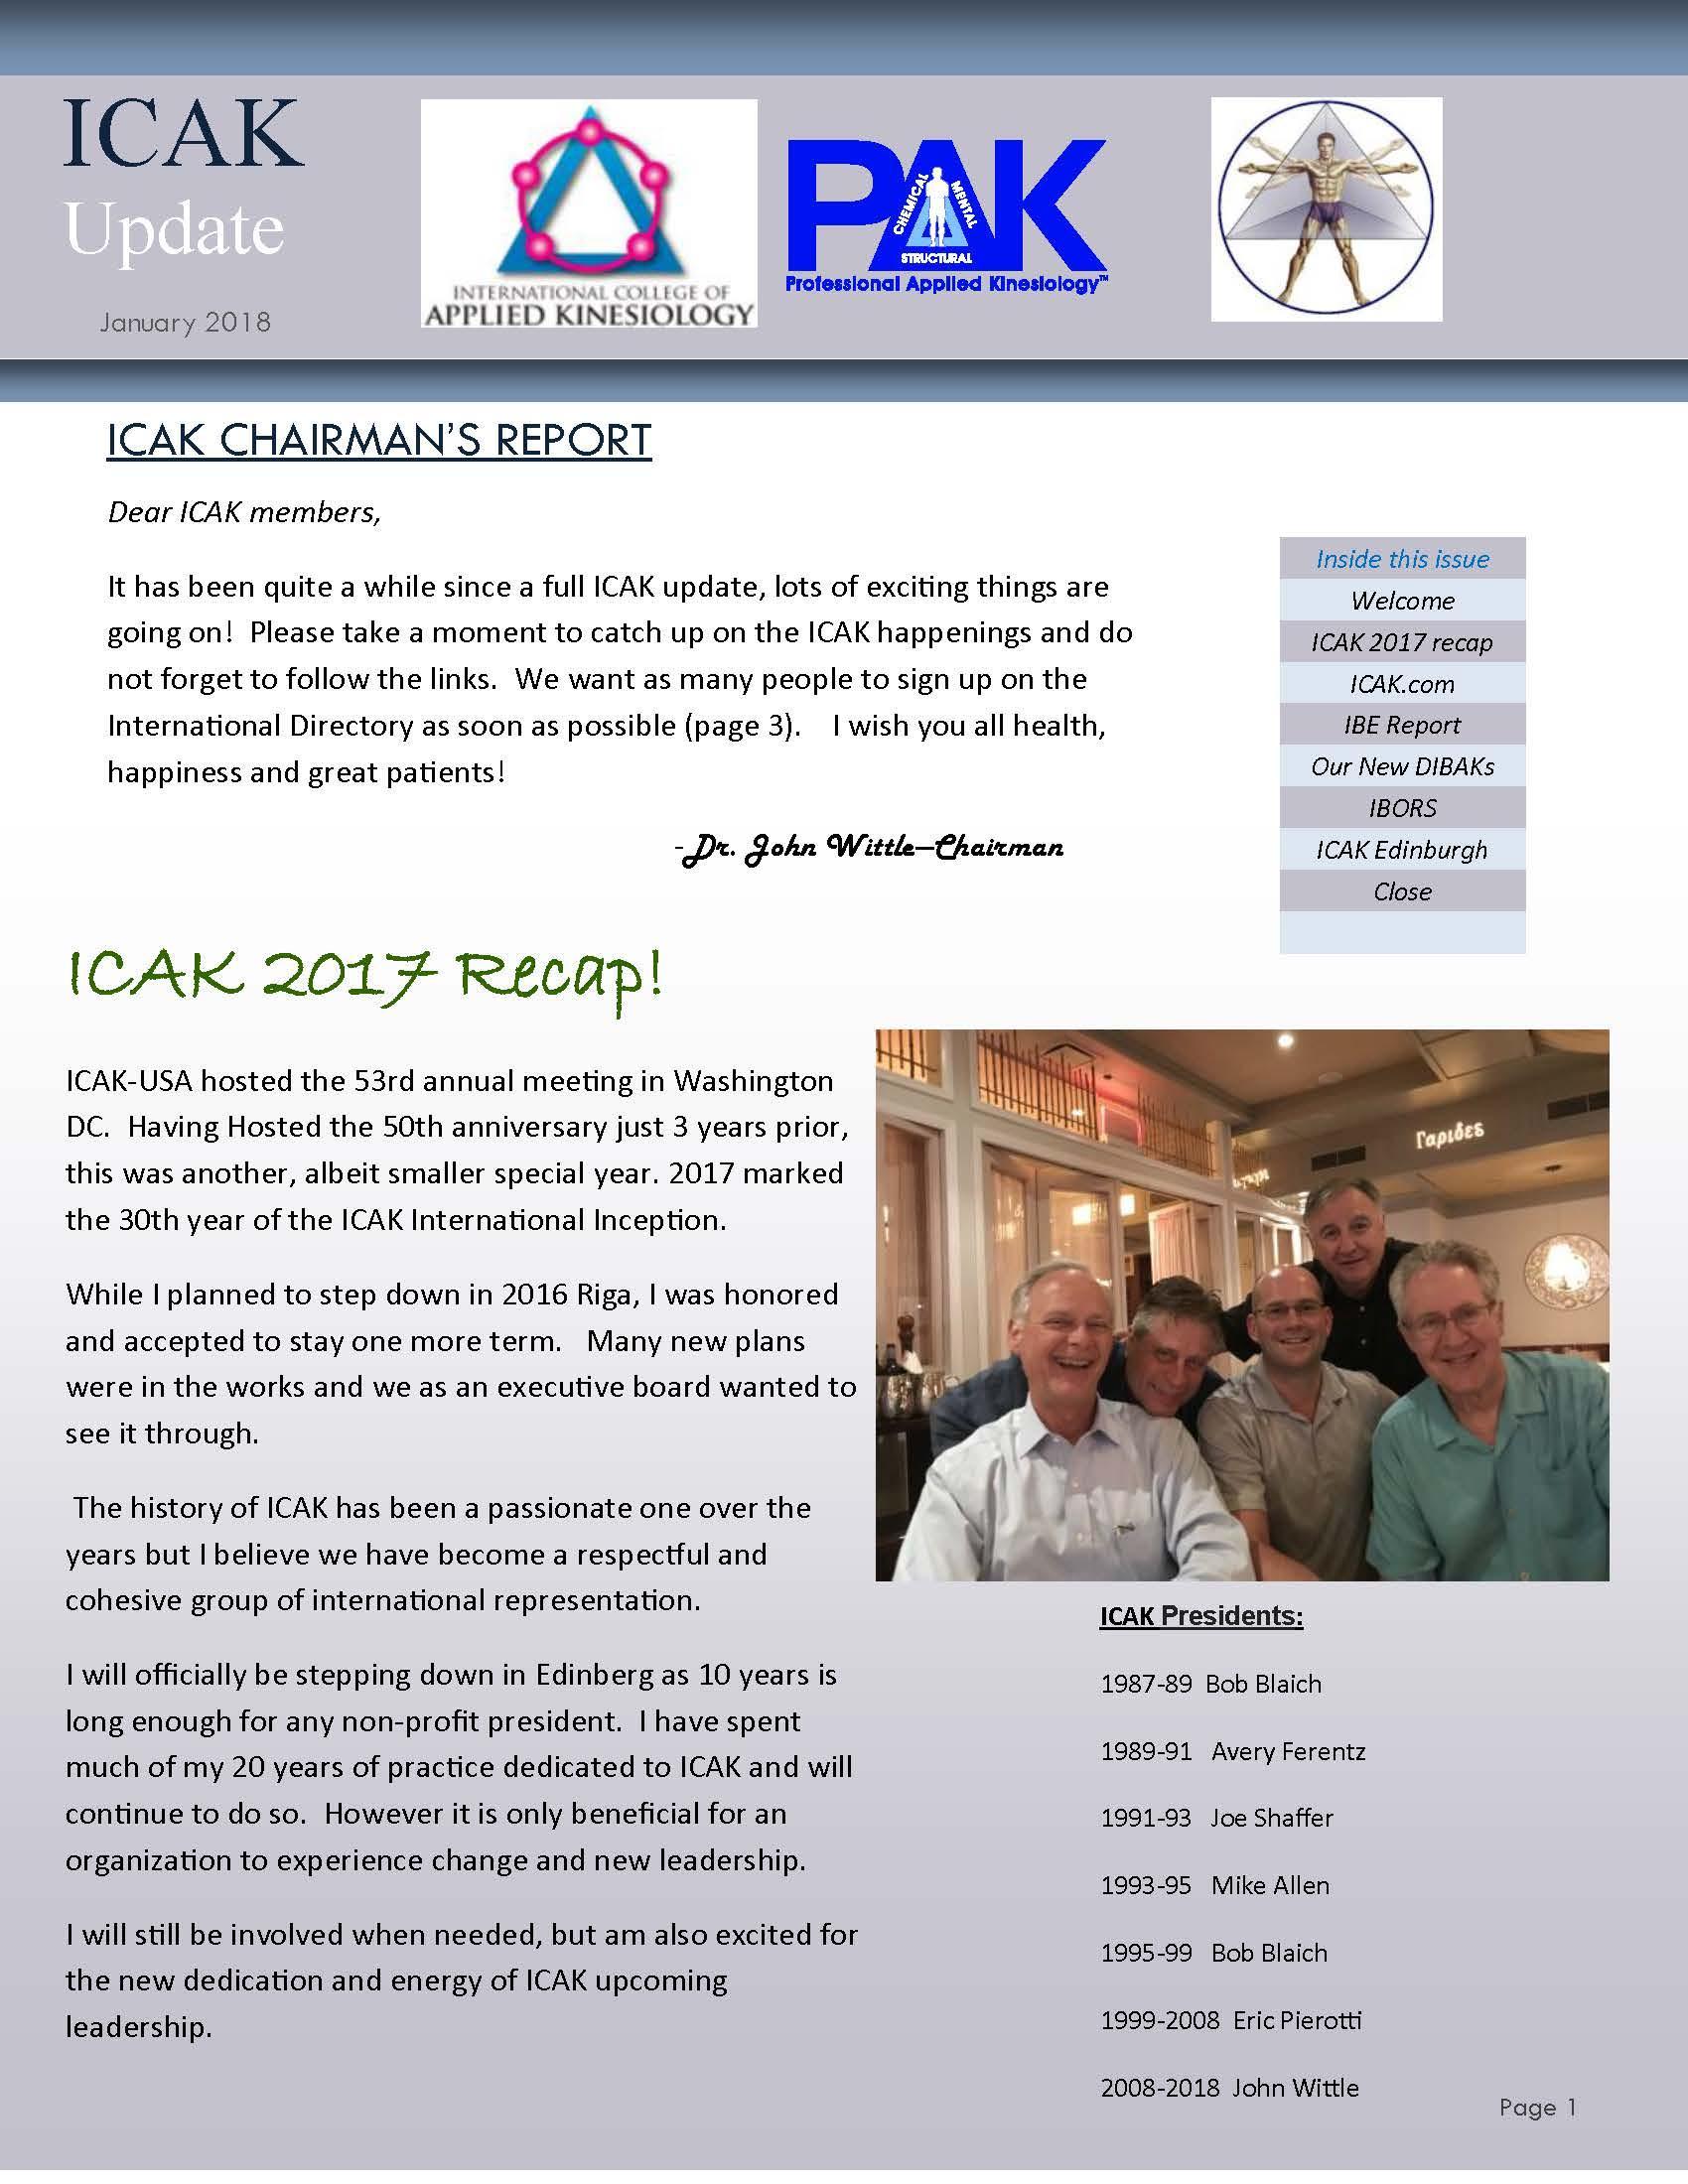 ICAK Update January 2018